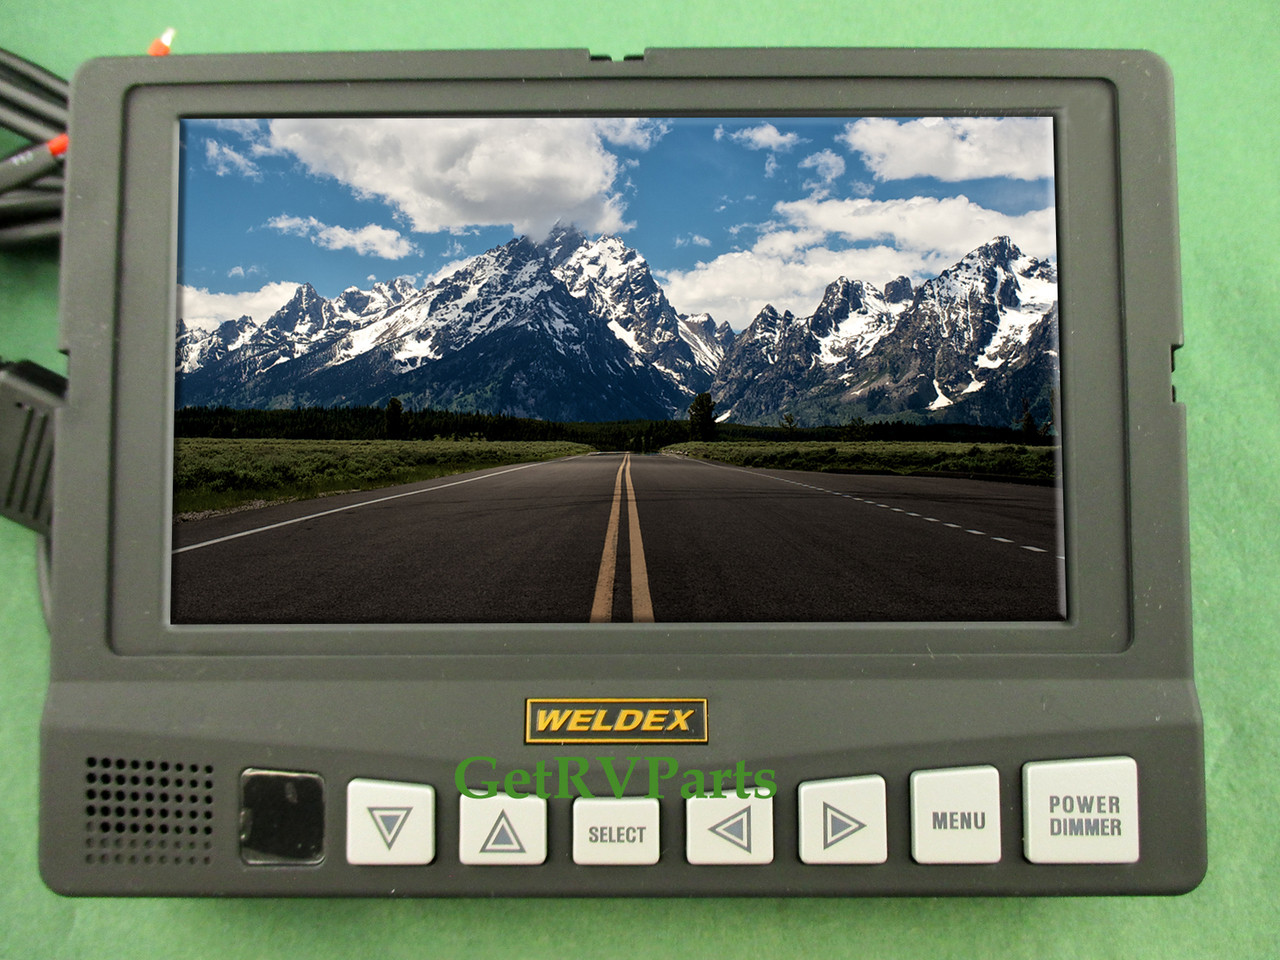 Weldex WDRV-7041M Rear View 7 Inch Backup Monitor on